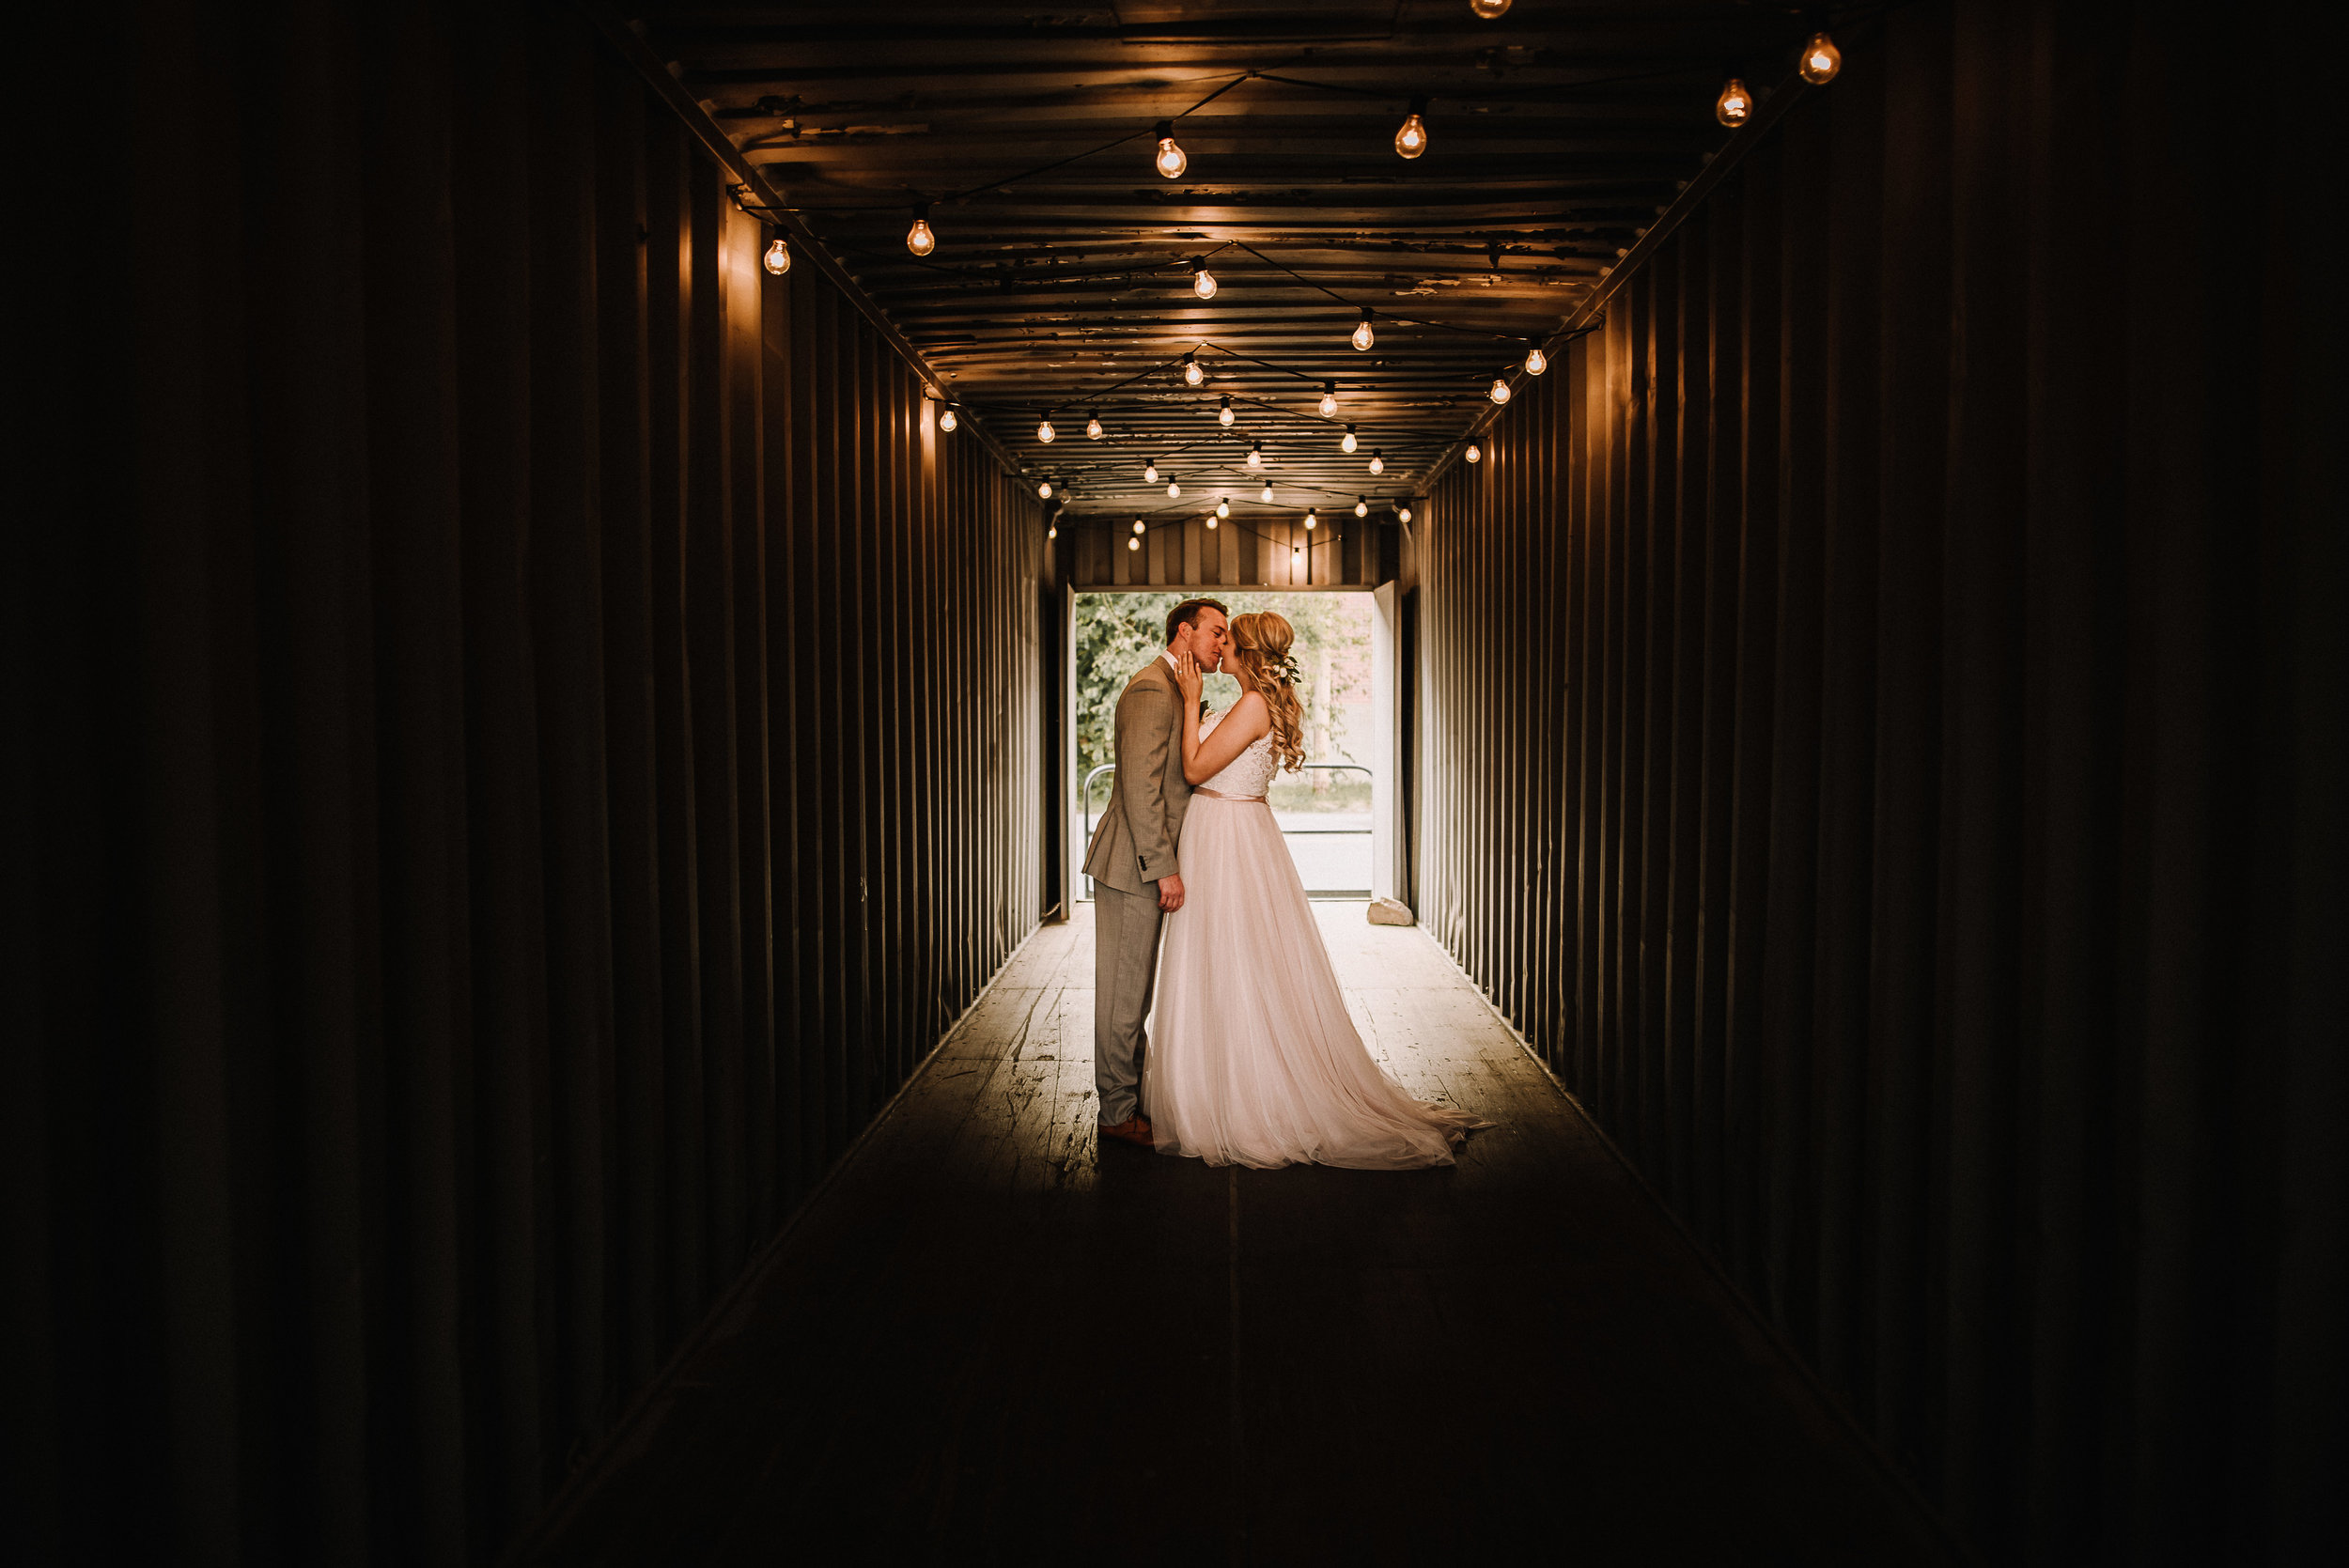 Pearson-Wiseacre-Wedding_Ashley-Benham-Photography (268 of 633).jpg